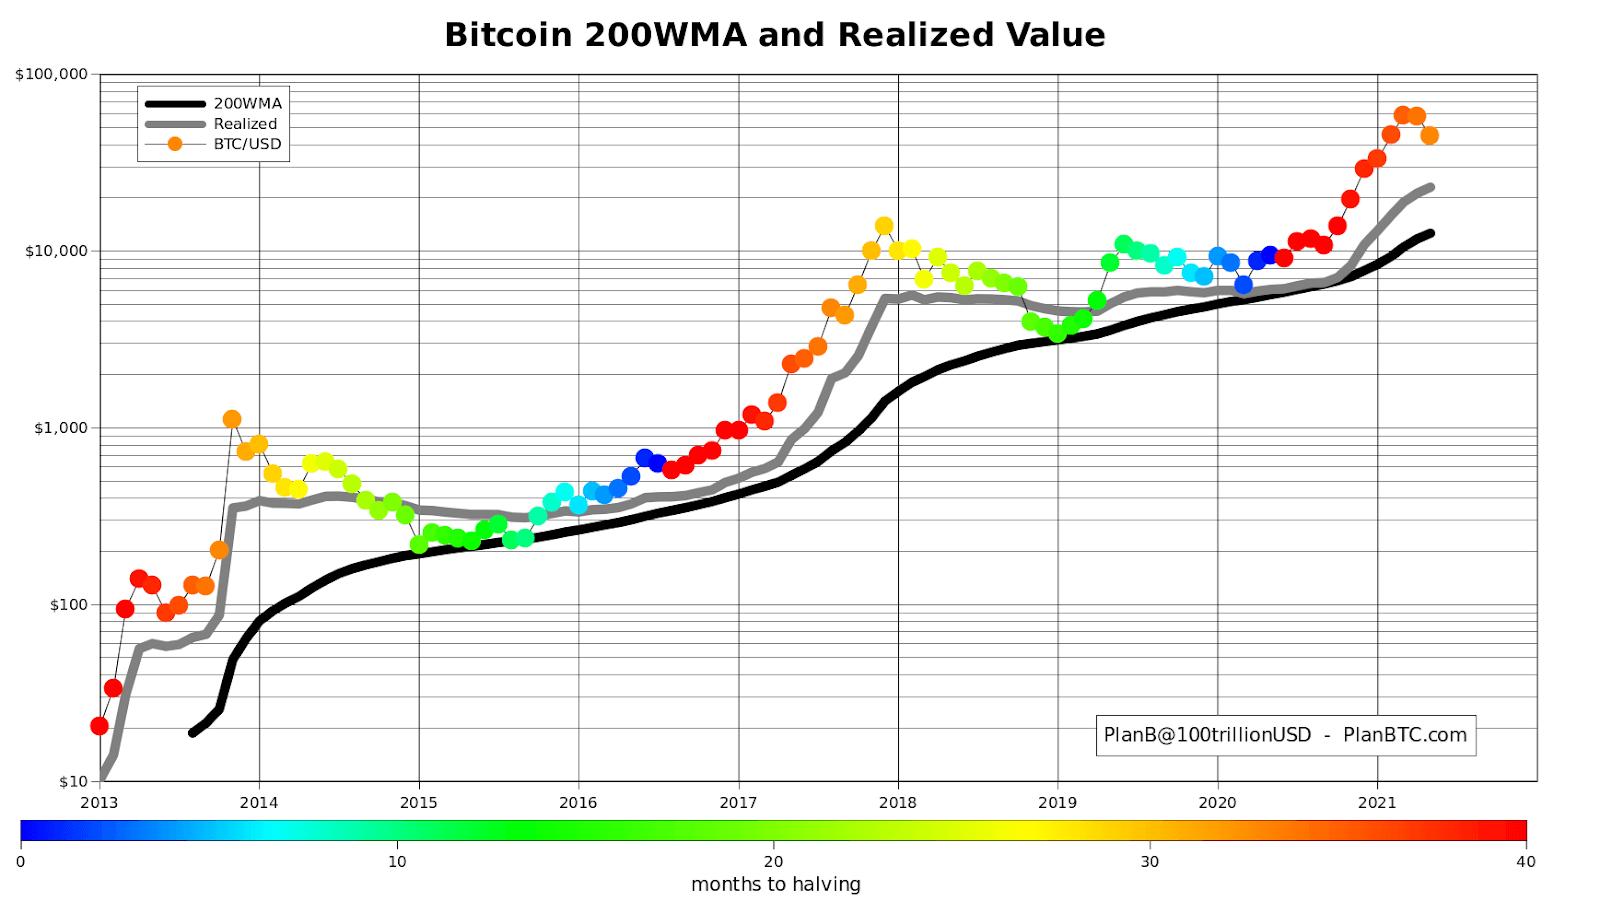 Bitcoin BTC 200WMA and Realized Value